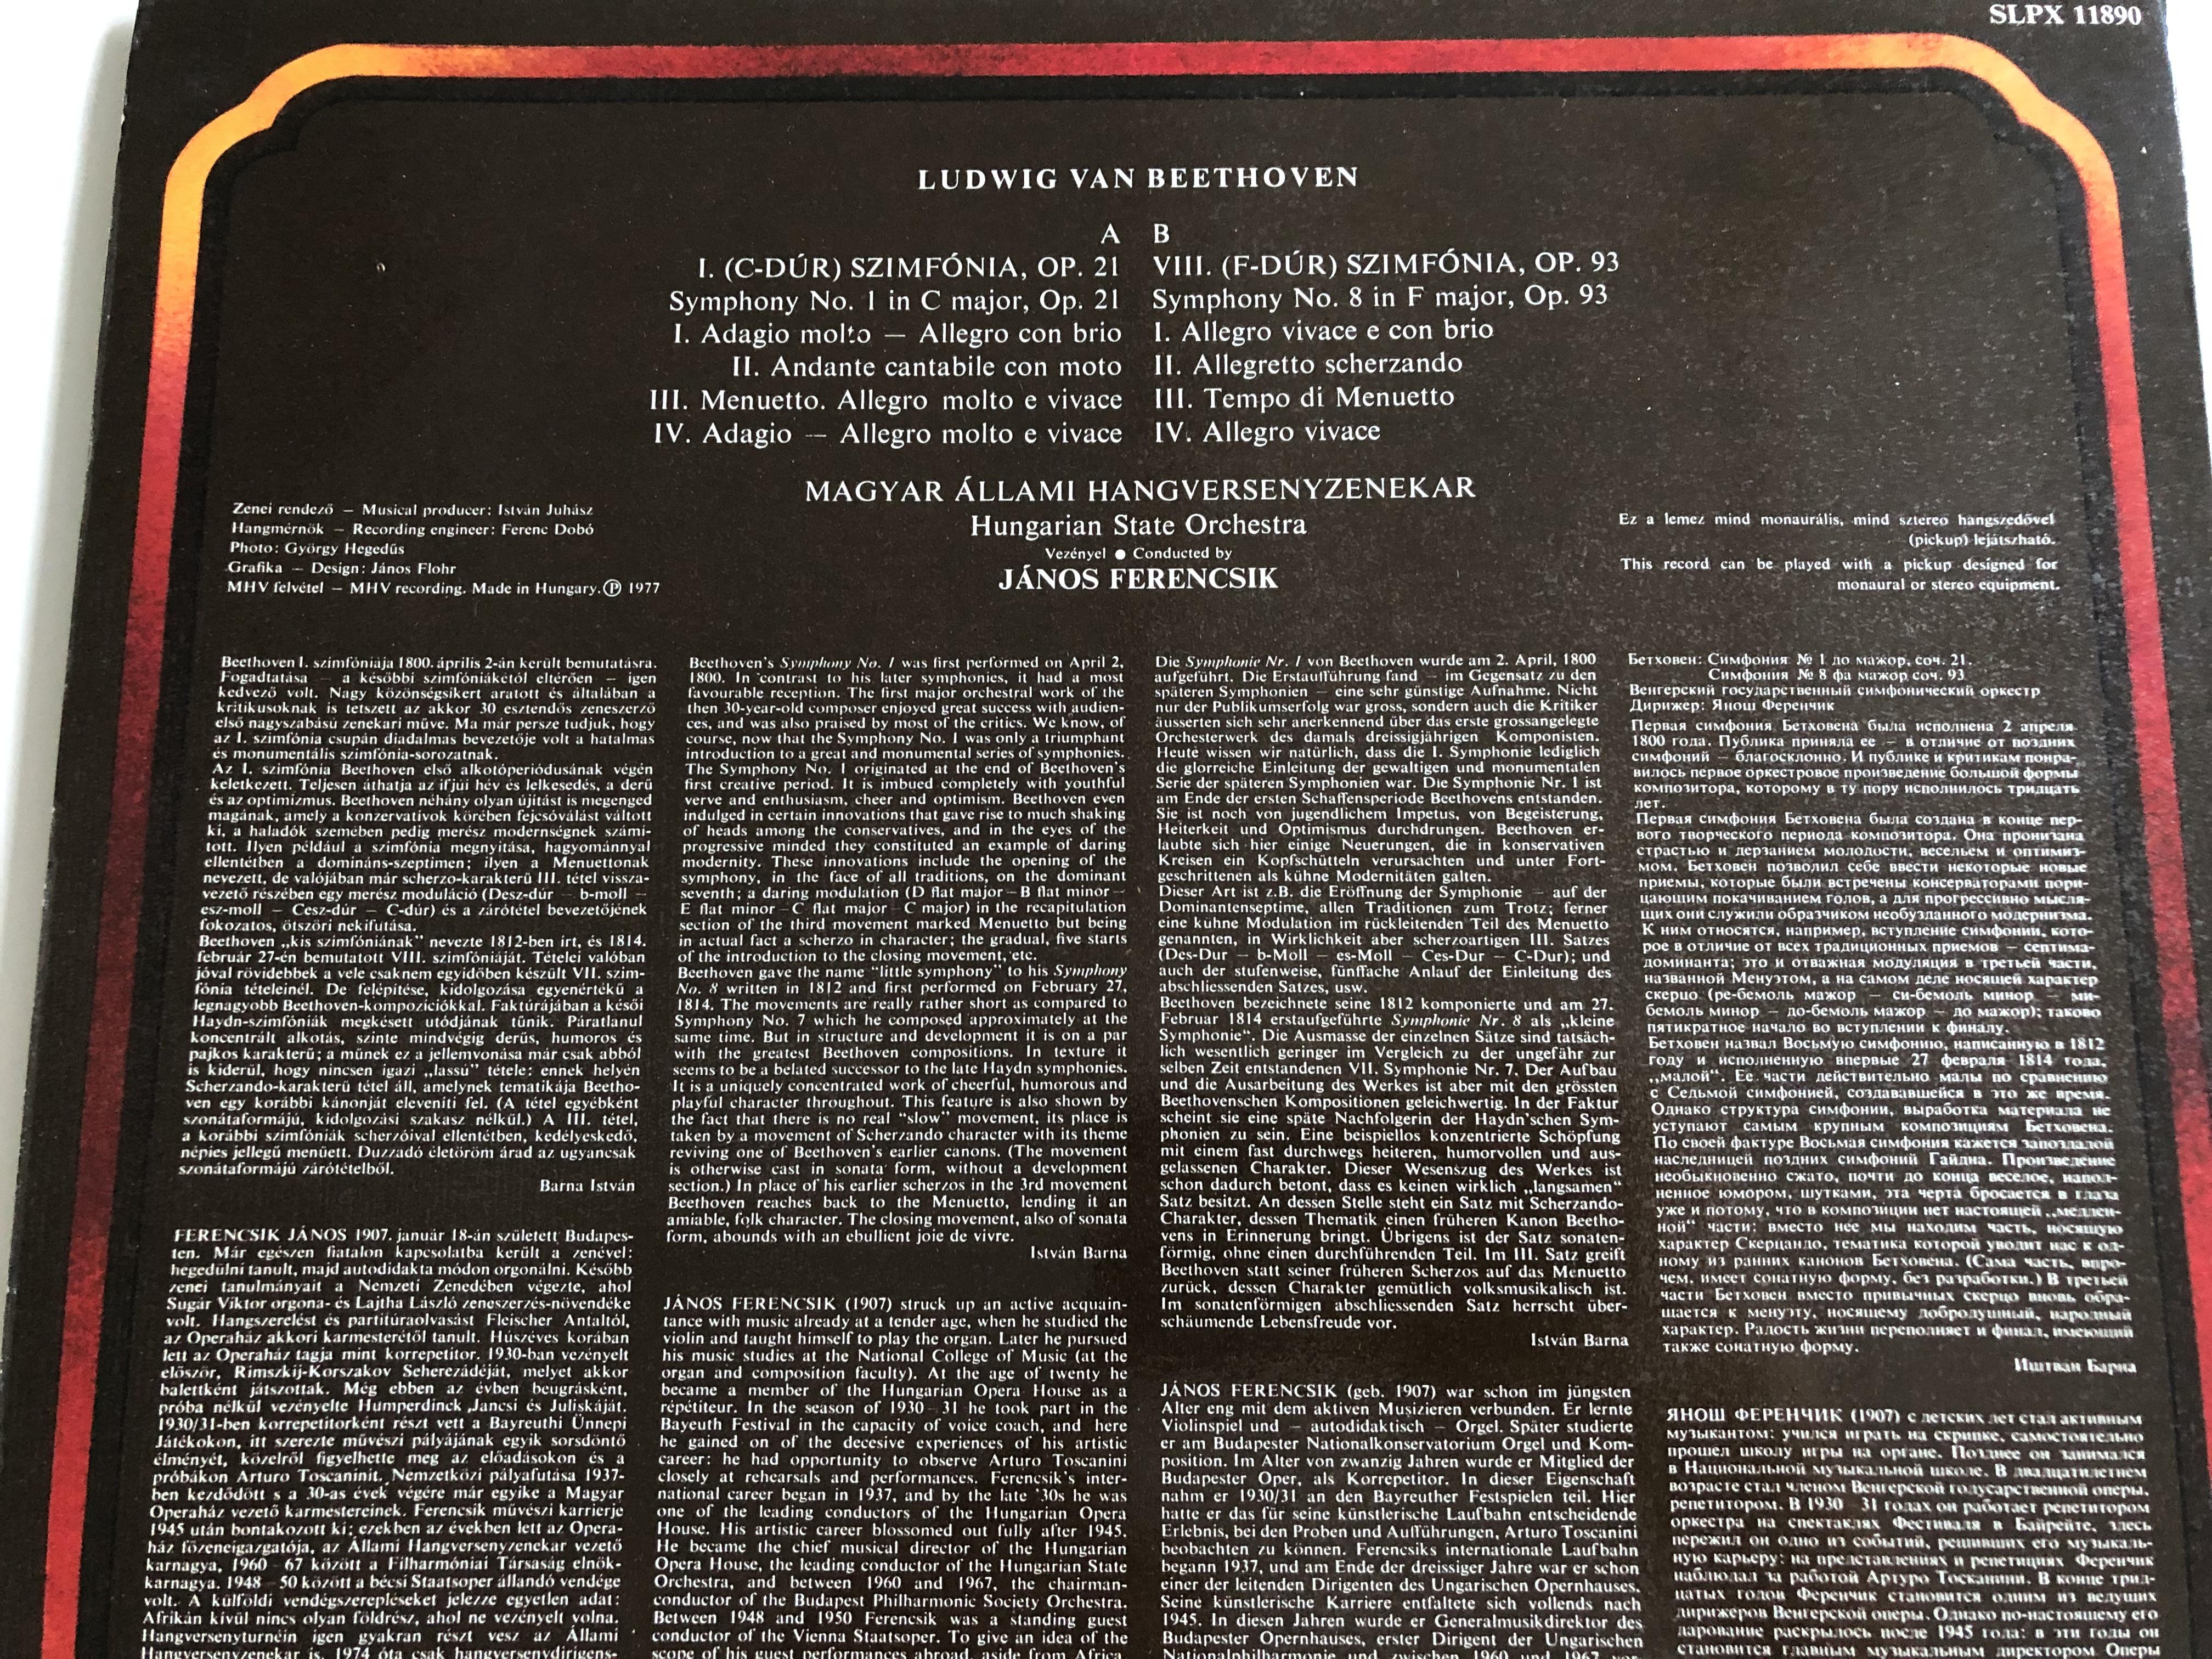 ludwig-van-beethoven-symphonies-nos.-1.-8-hungarian-state-orchestra-j-nos-ferencsik-hungaroton-lp-stereo-mono-slpx-11890-3-.jpg